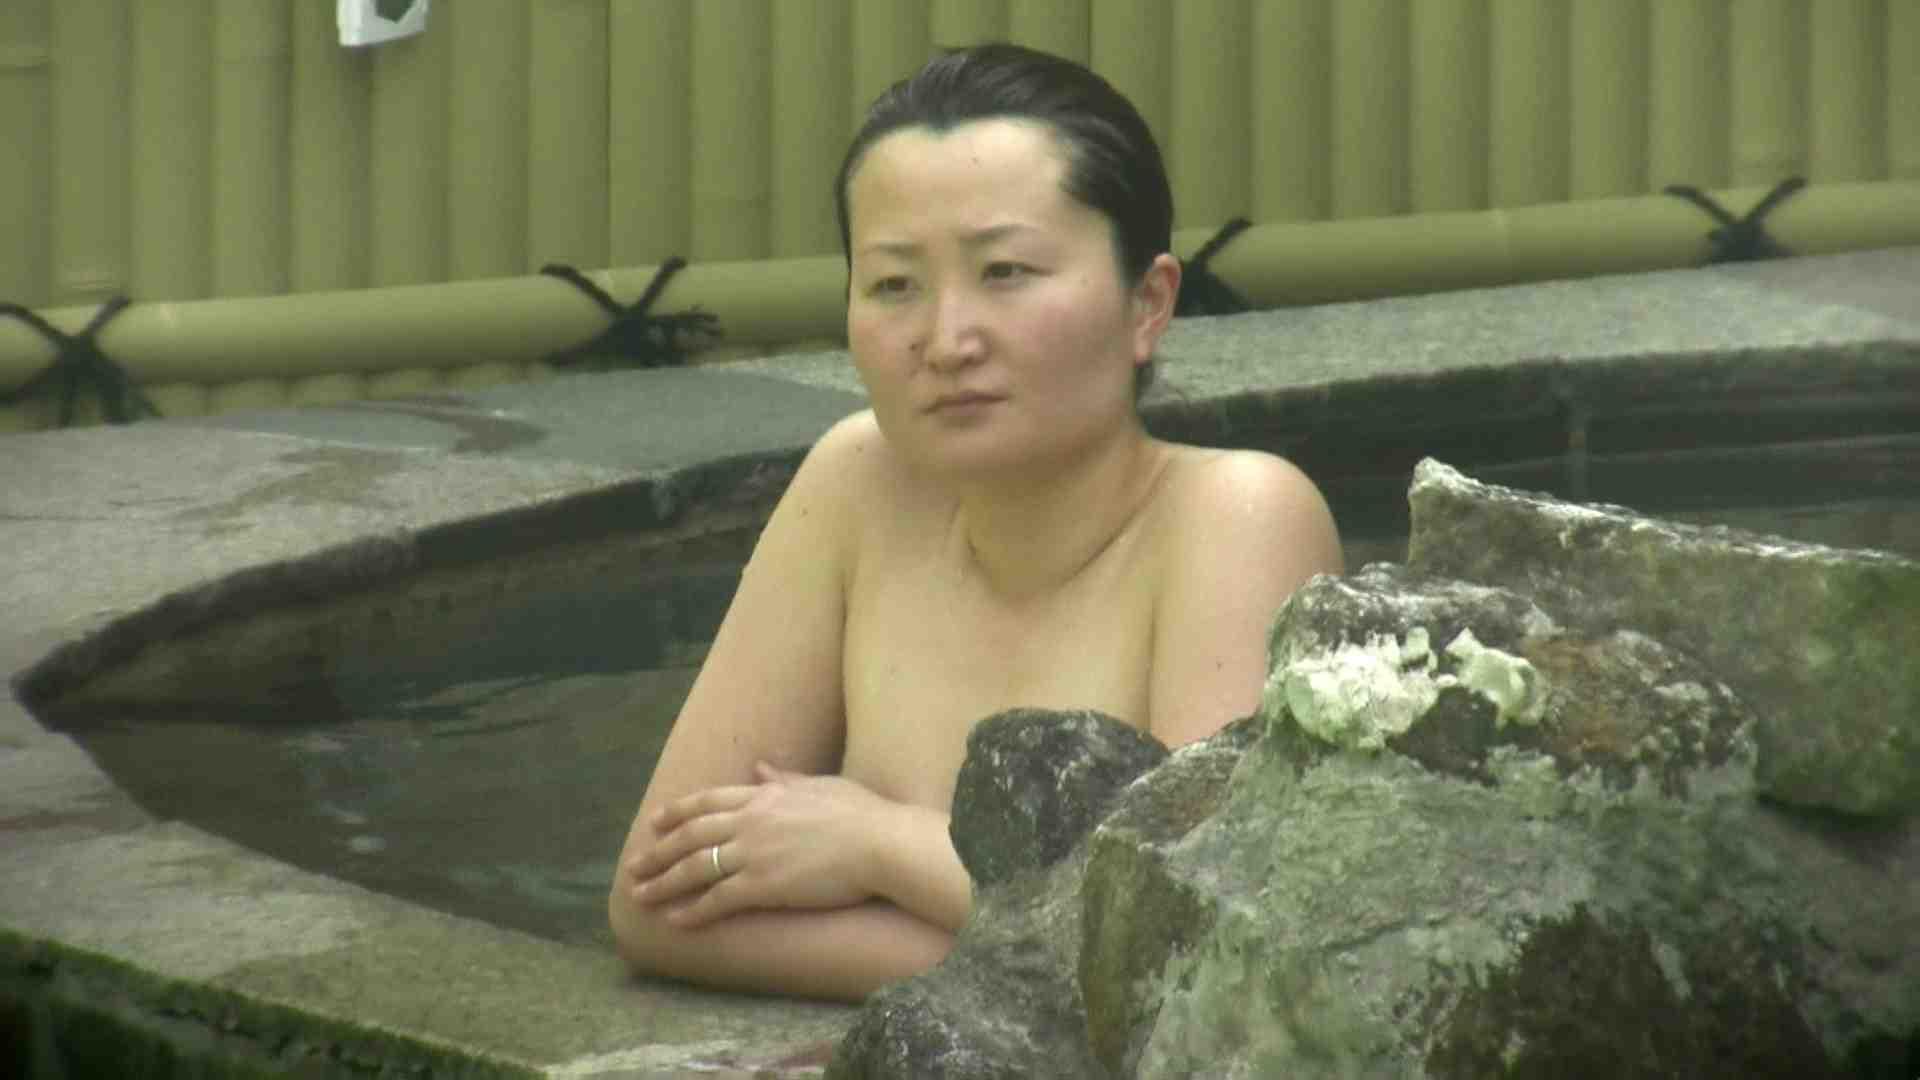 Aquaな露天風呂Vol.632 盗撮 | OLセックス  70画像 67